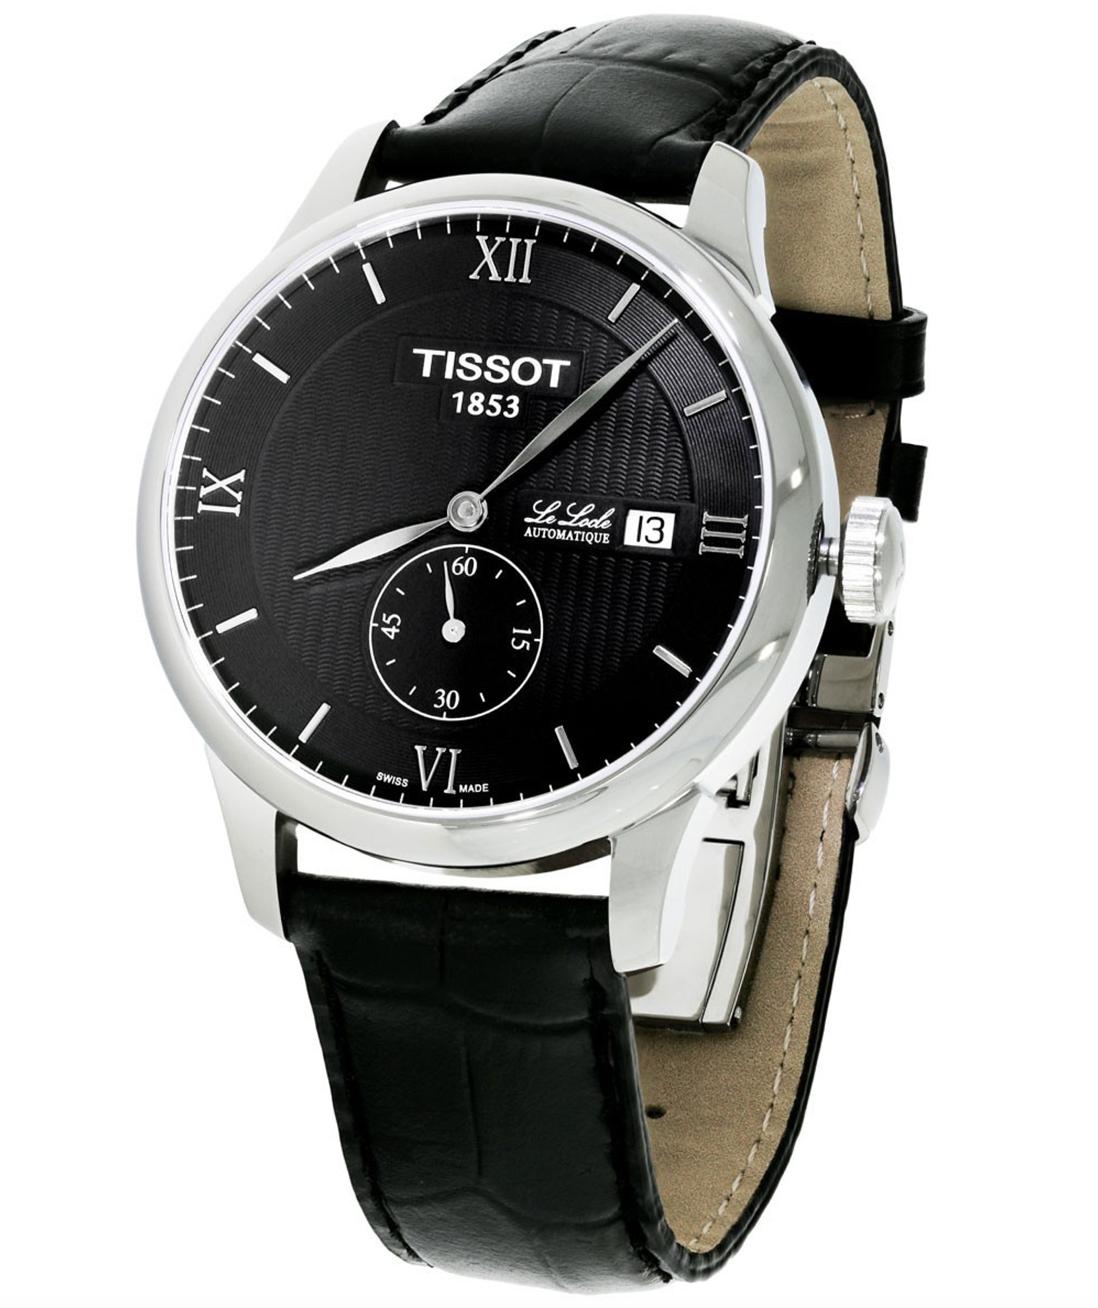 Tissot T Classic Le Locle Automatic Petite Men's Watch ( T0064281605801, Saphirglas, Gehäusebreite: 40 mm (ohne Krone), 3 bar / 30 m )